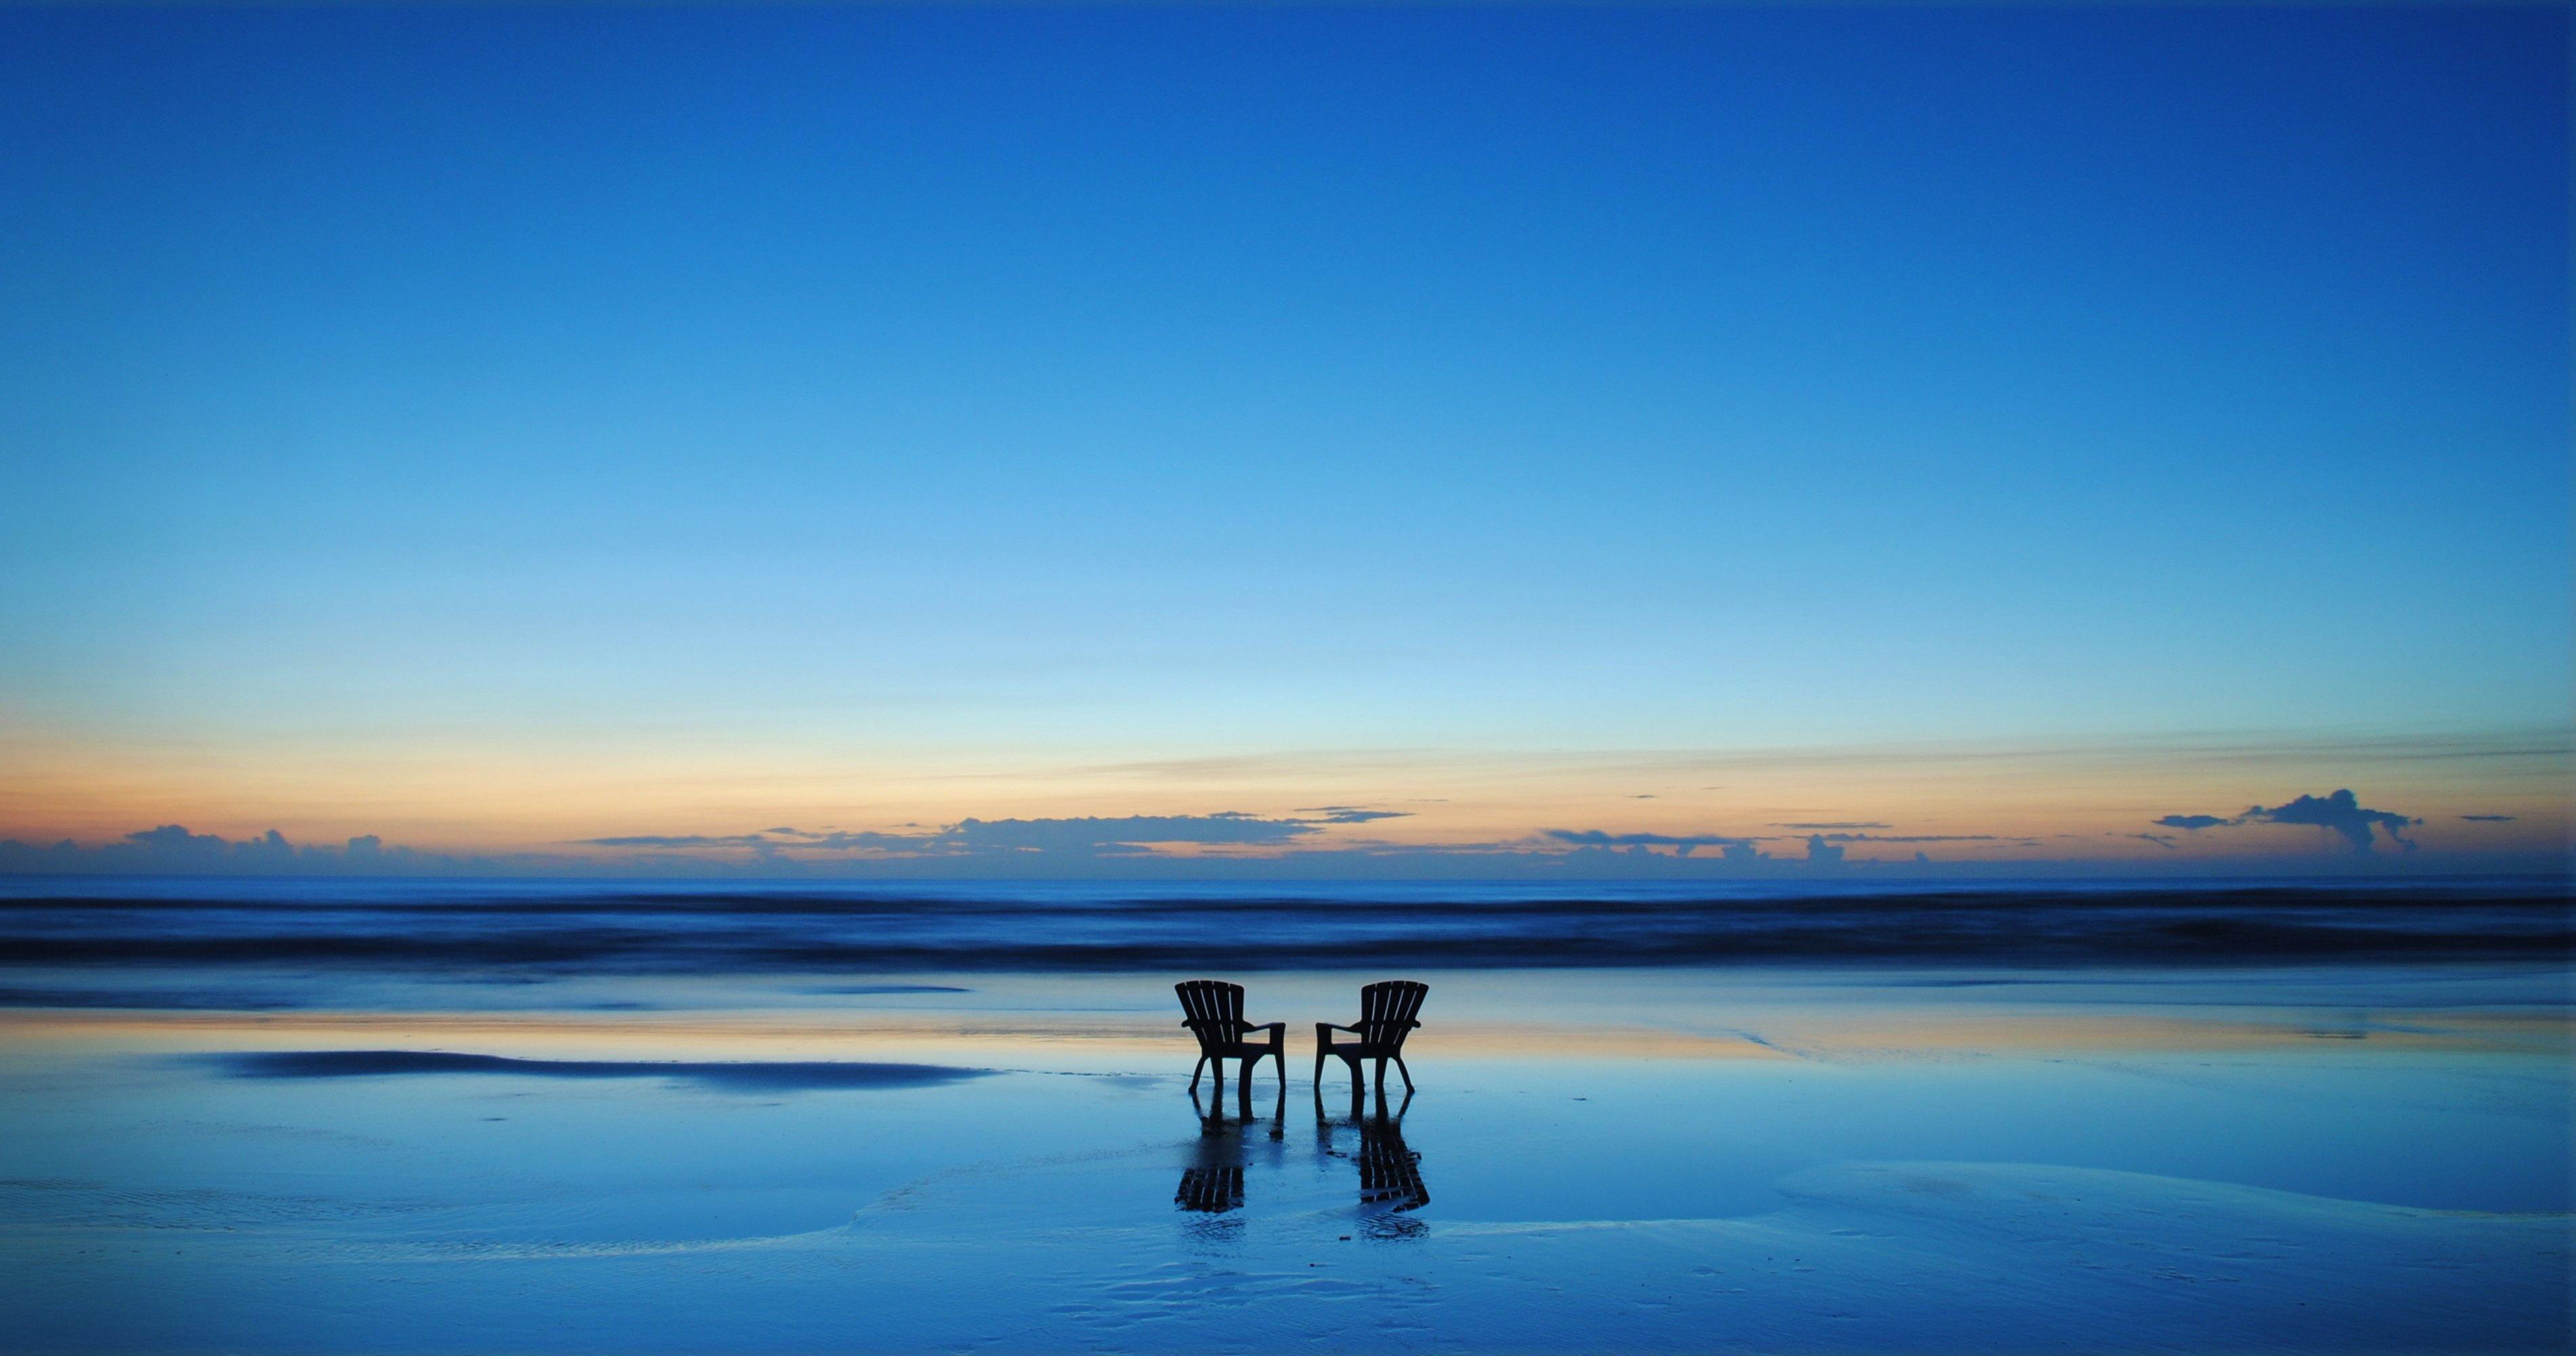 Beach sunset with chairs - Beach Sunset With Chairs